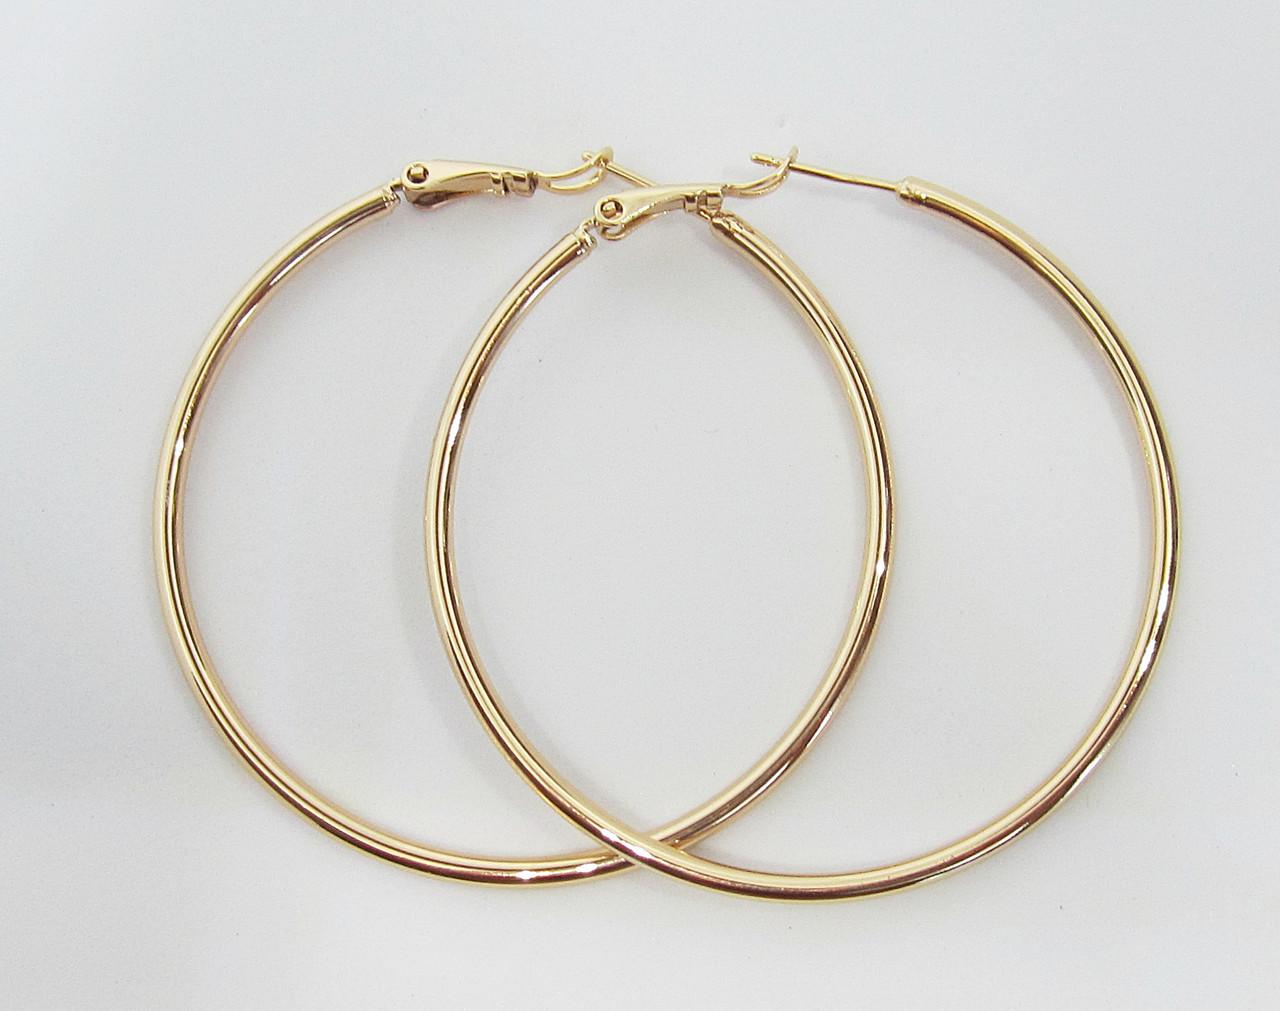 Серьги кольца Xuping Диаметр - 5 см